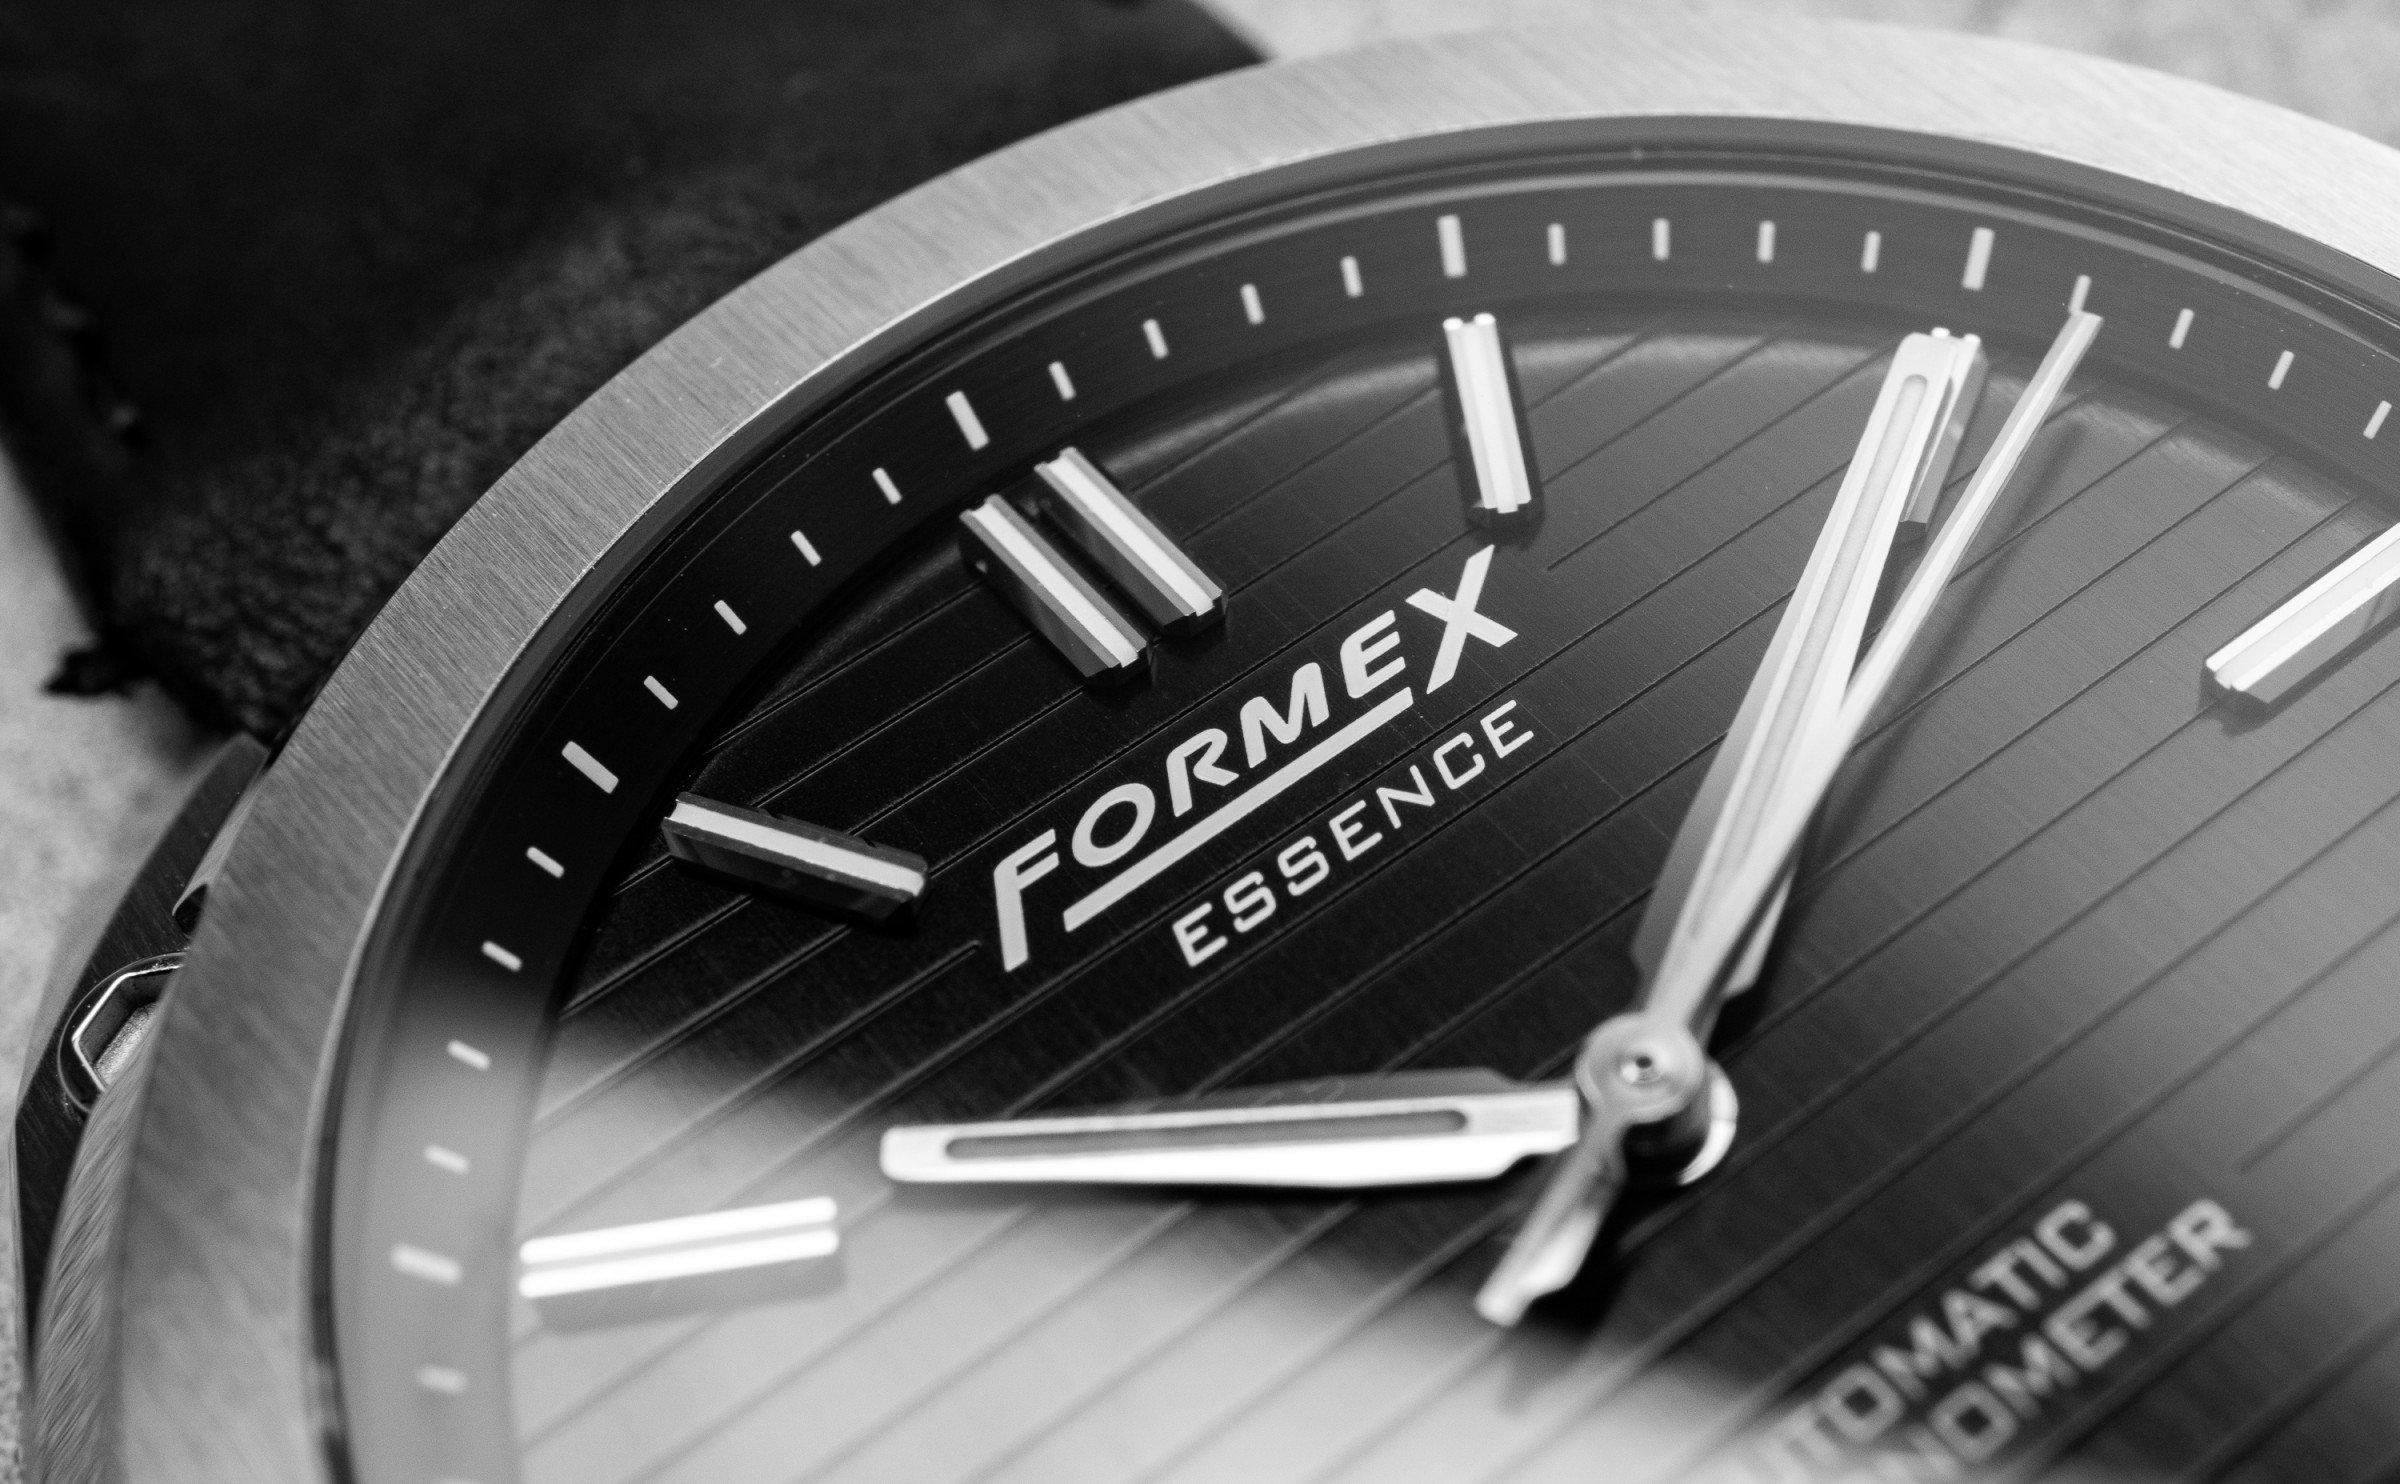 FORMEX Essence Automatik Chronometer Kickstarter